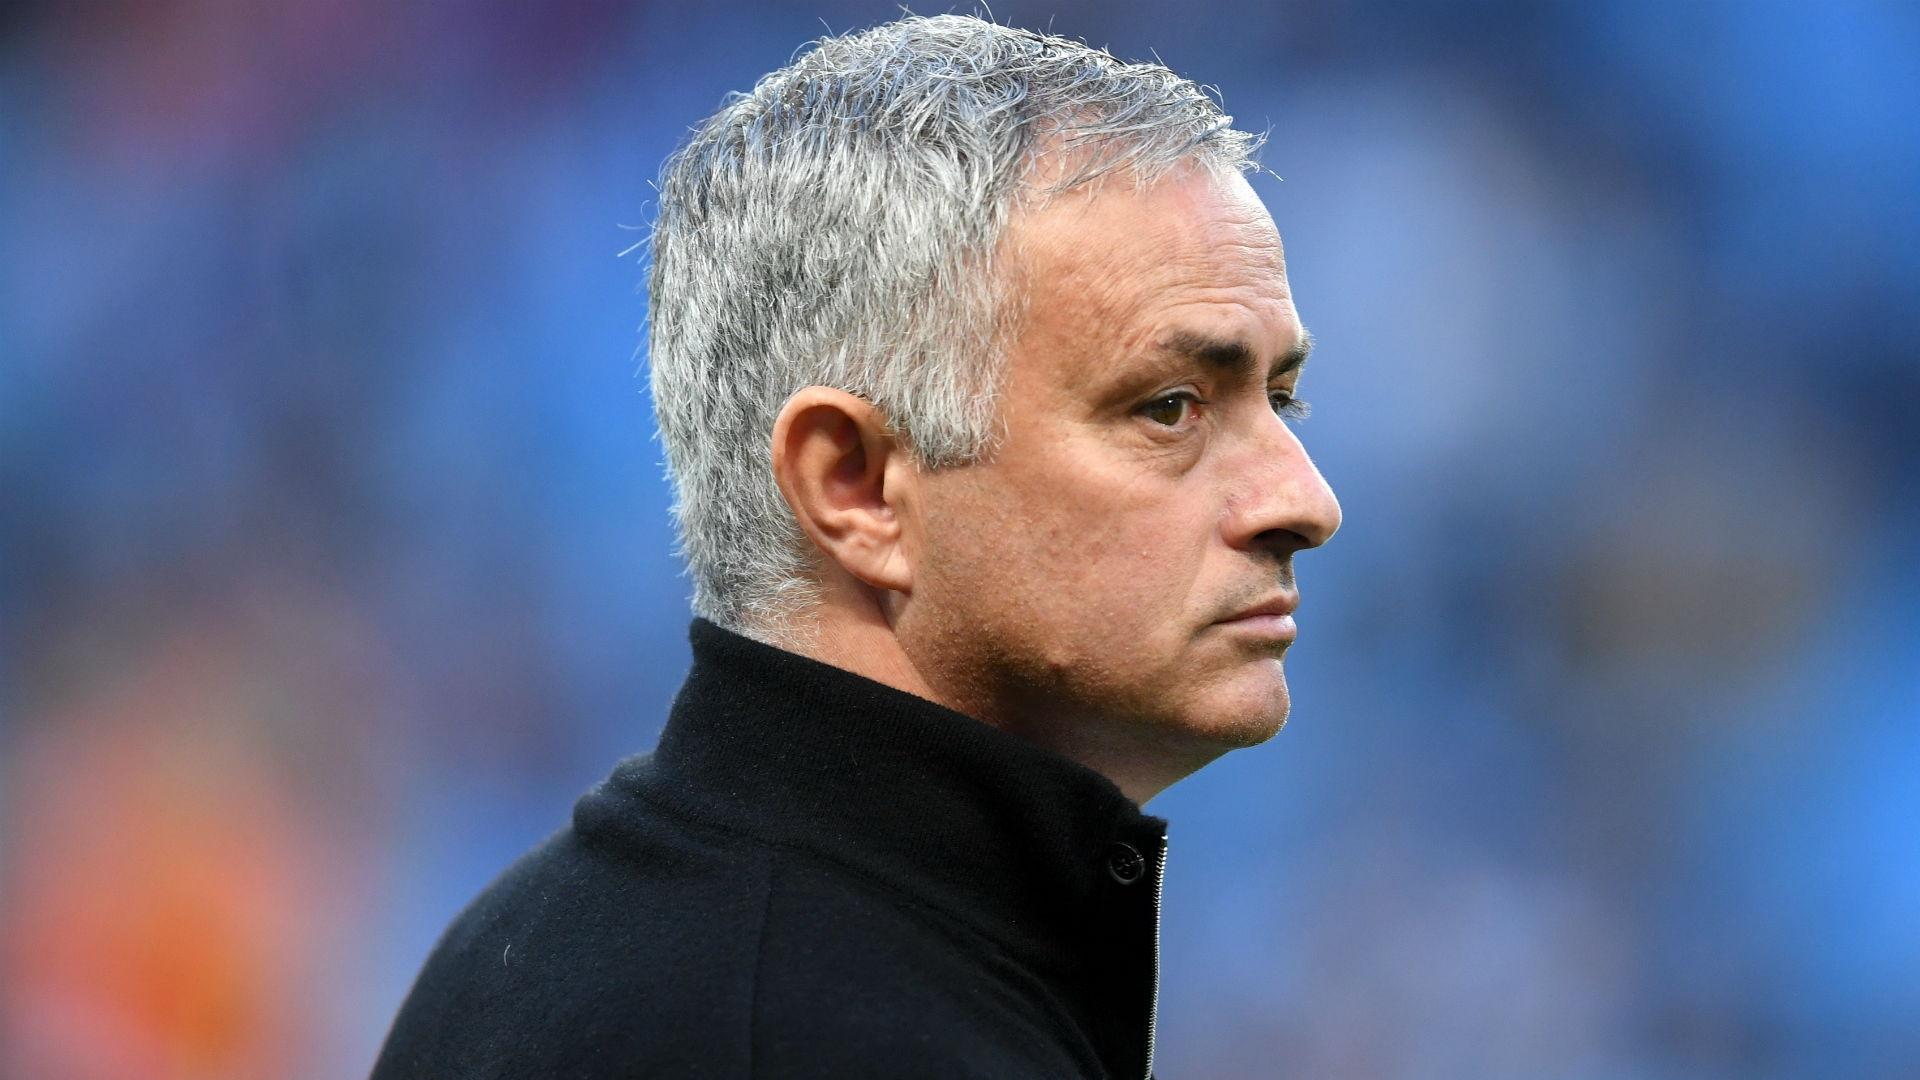 Jose Mourinho Mengecam Kritik Atas Kekalahan MU